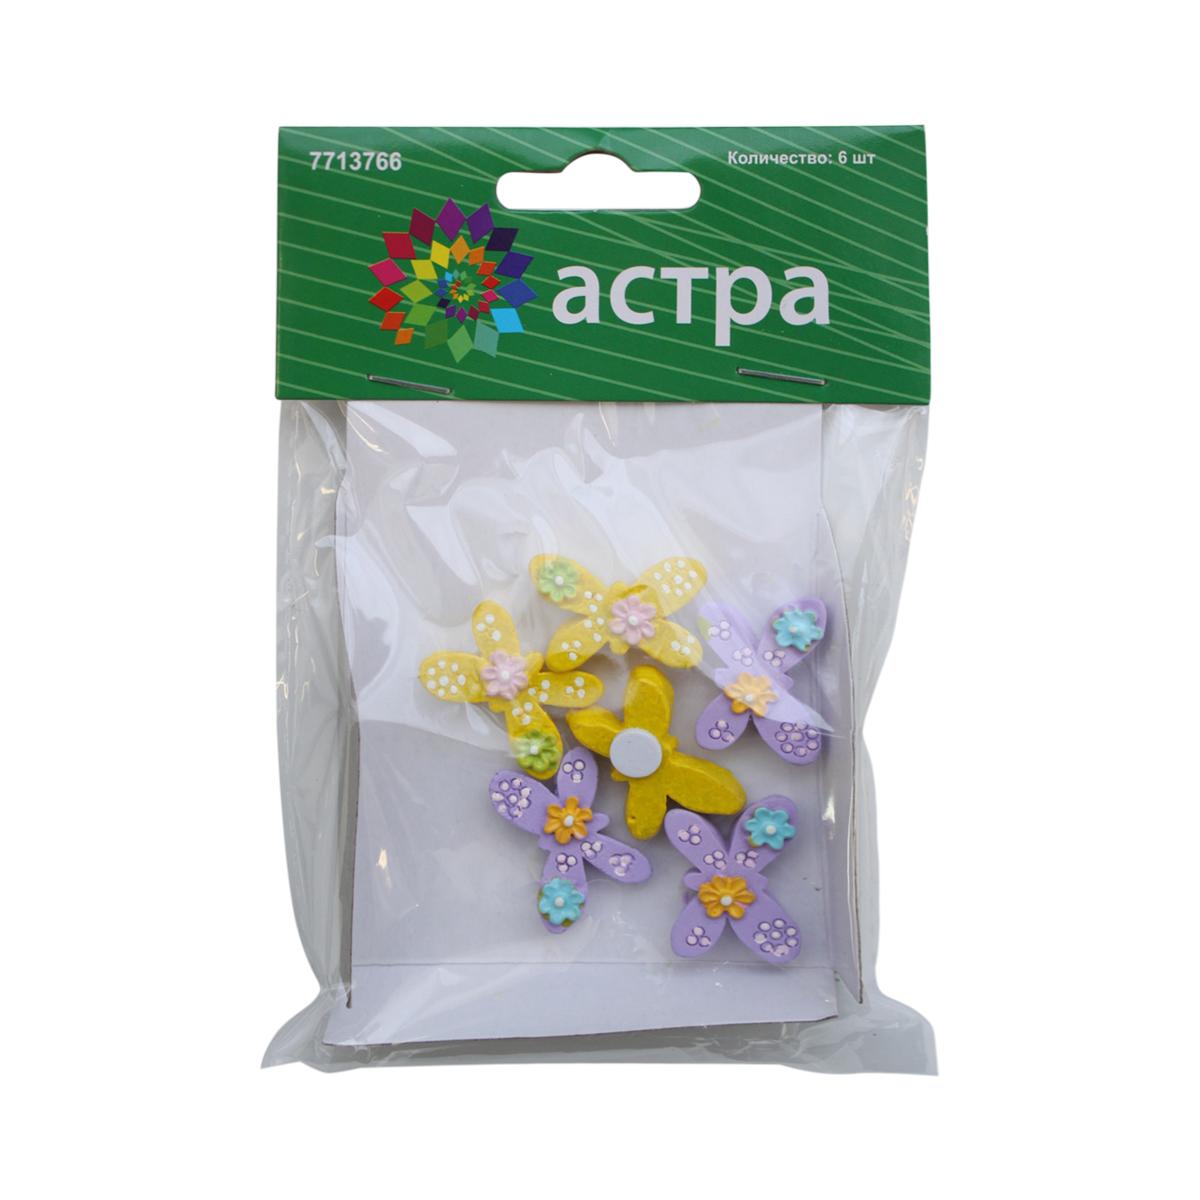 Фигурка декоративная Астра Бабочка, цвет: фиолетовый, желтый, 17 х 26 мм, 6 шт подвеска астра бабочка цвет серебристый 10 мм х 10 мм 100 шт